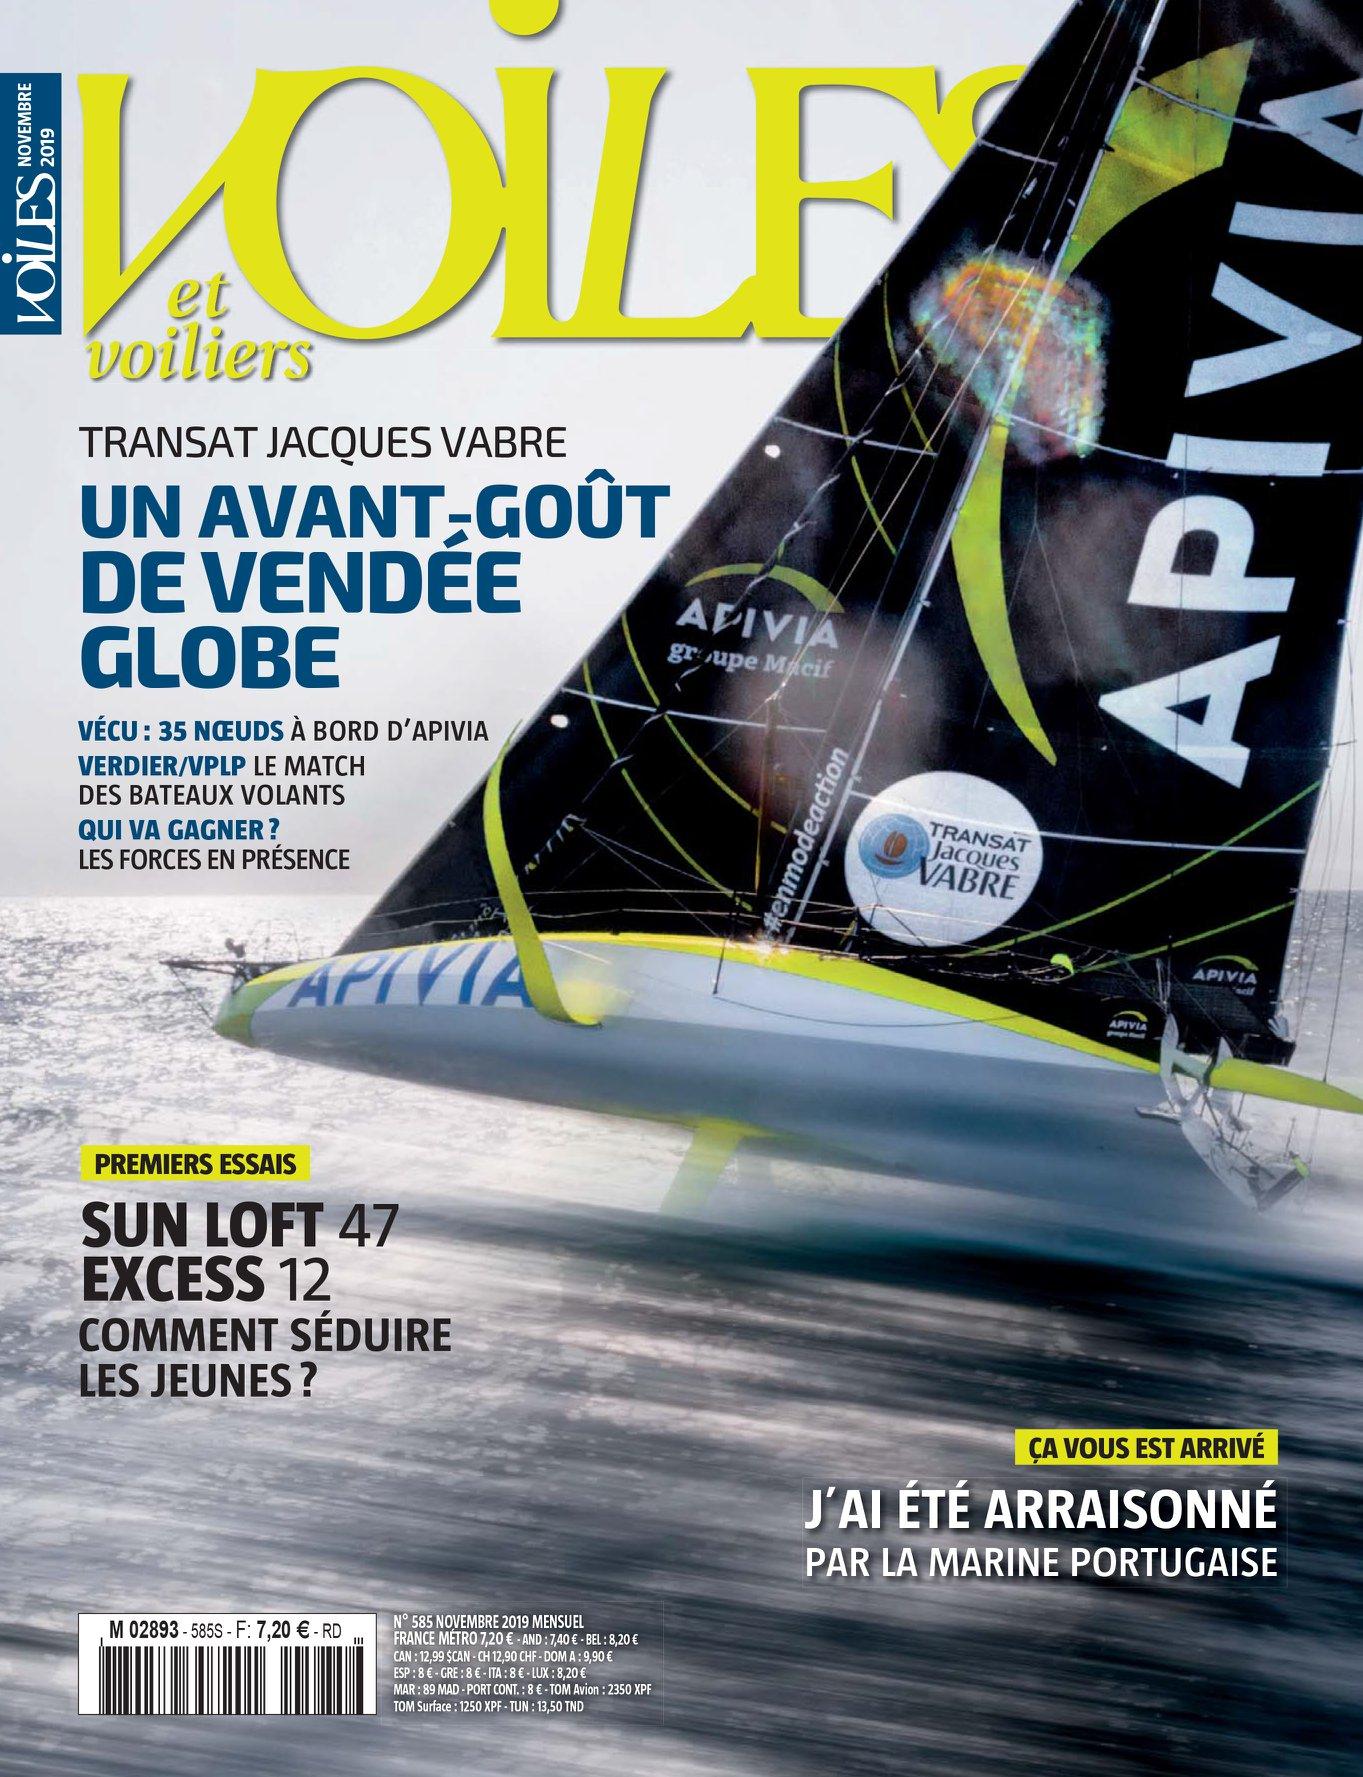 Press review,  Maxime Horlaville - MxHpics